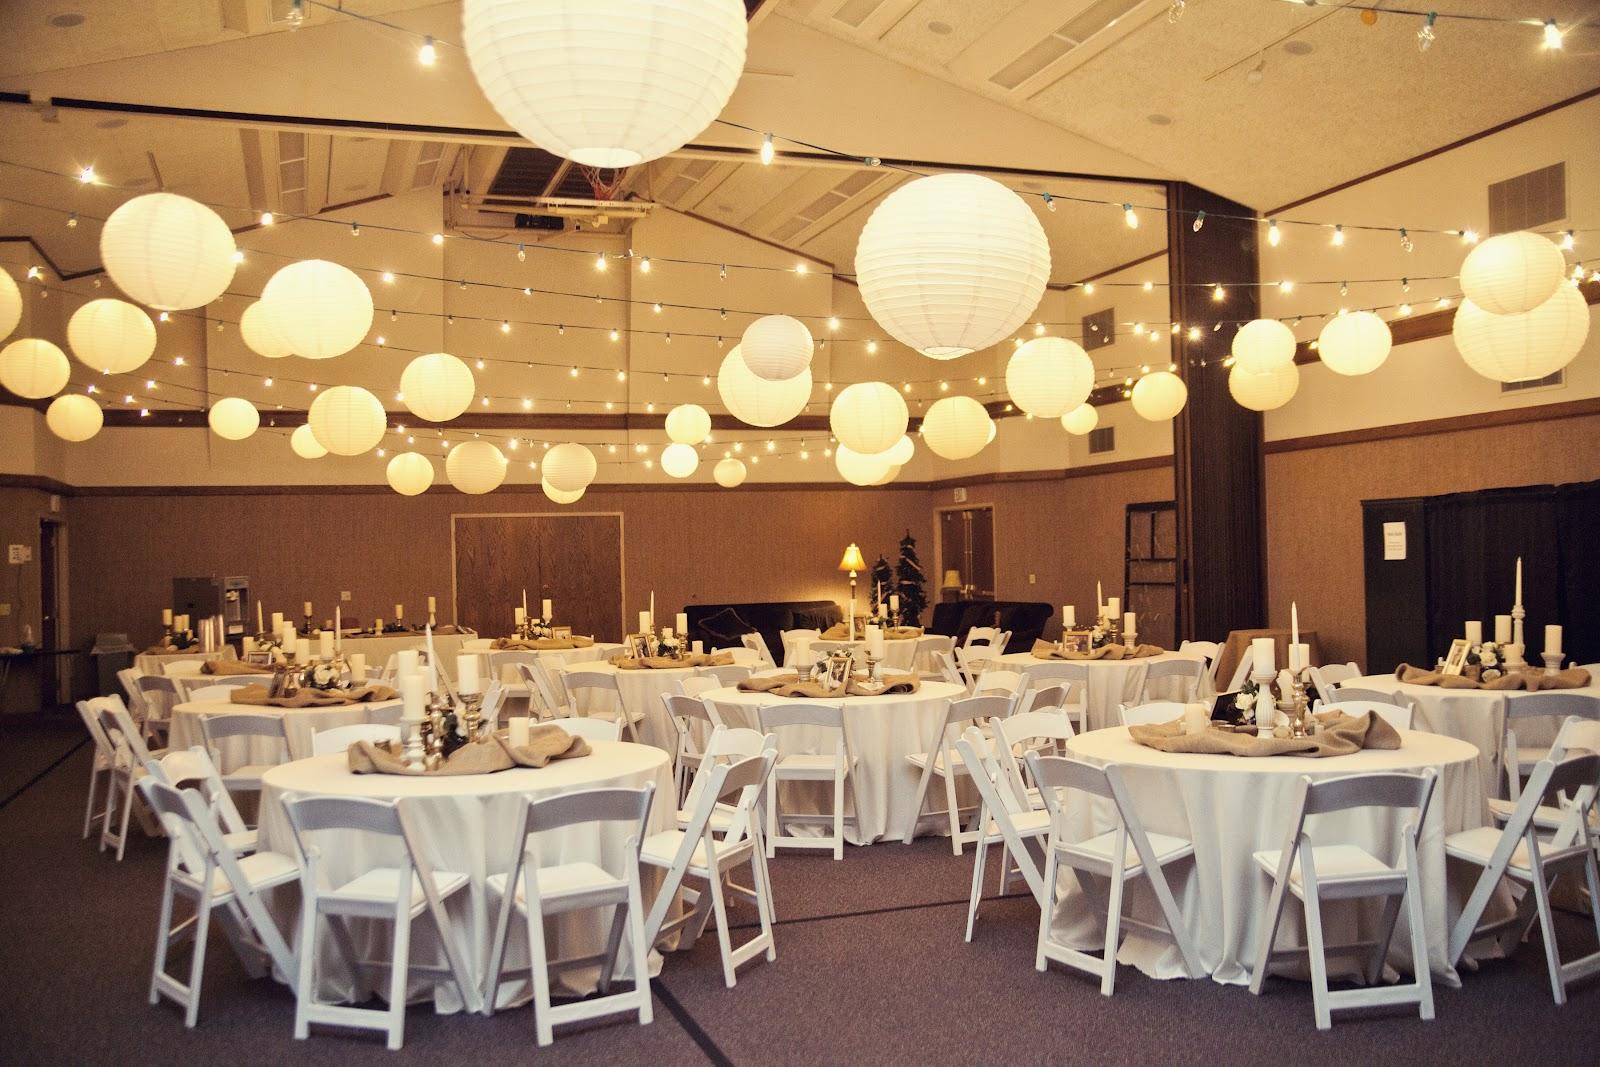 Decorating Ideas For Wedding Halls: Beehive Art Salon: Wedding